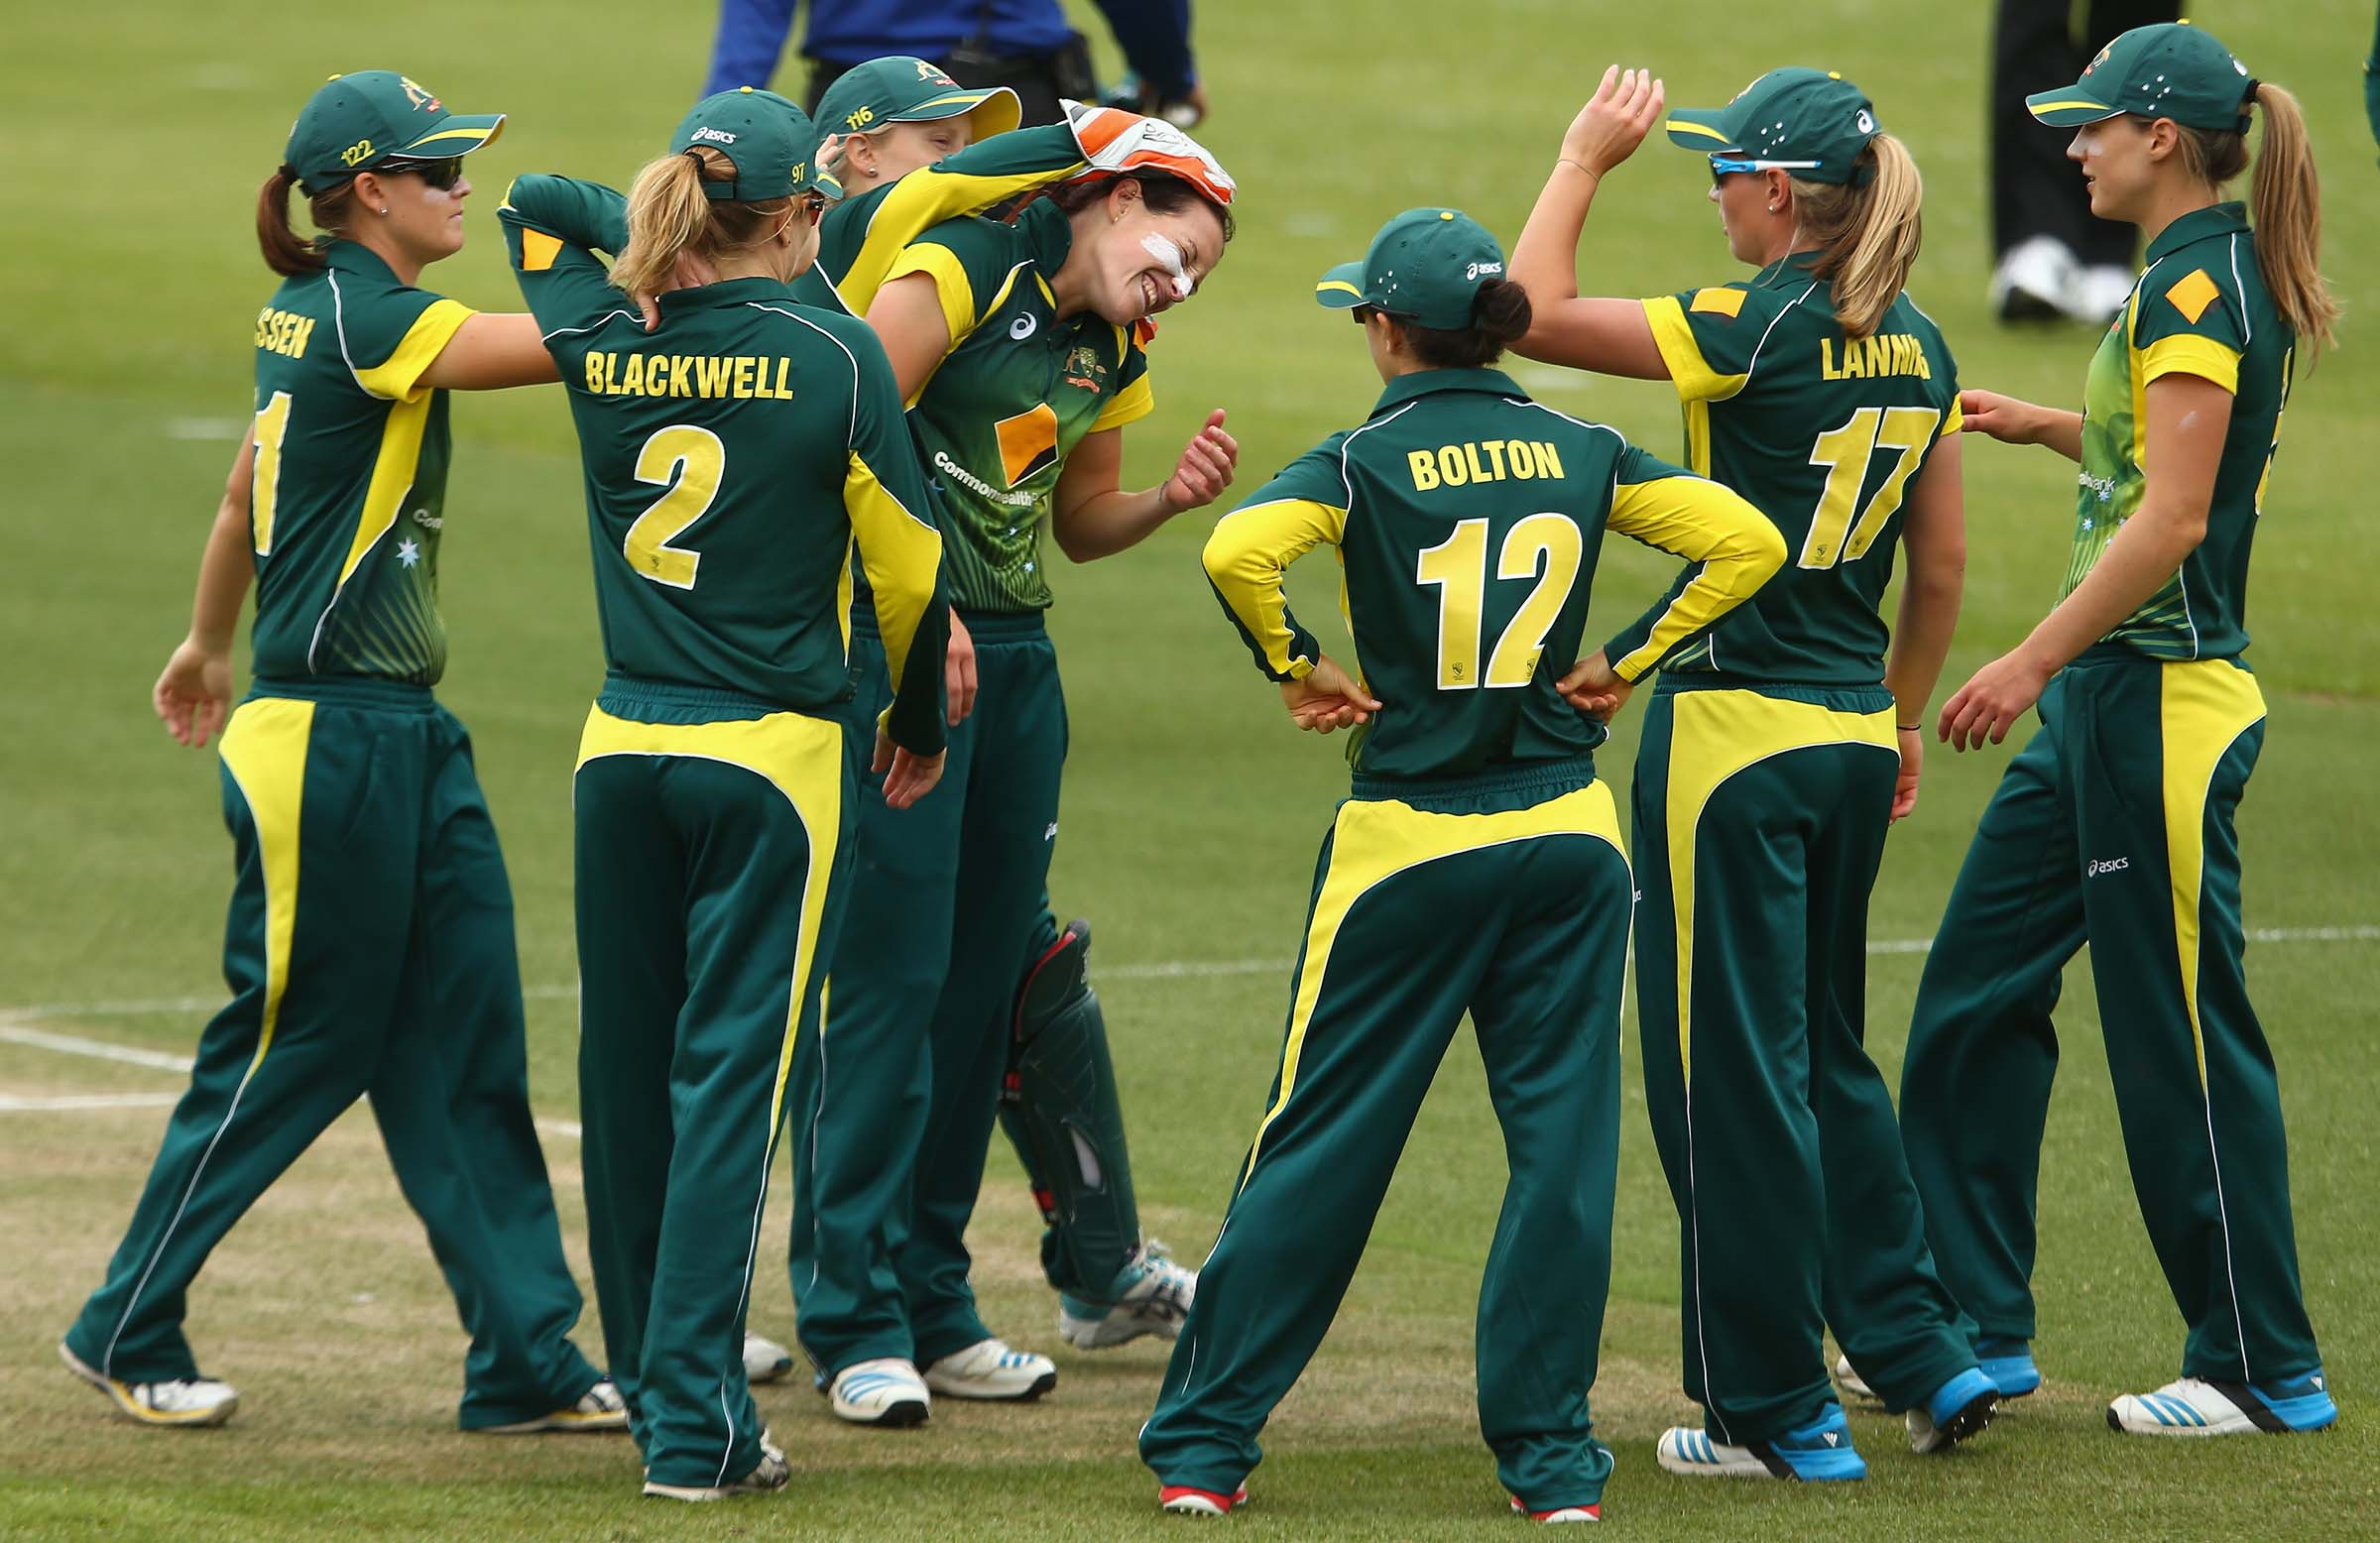 Schutt has been a regular wicket-taker for Australia // Getty